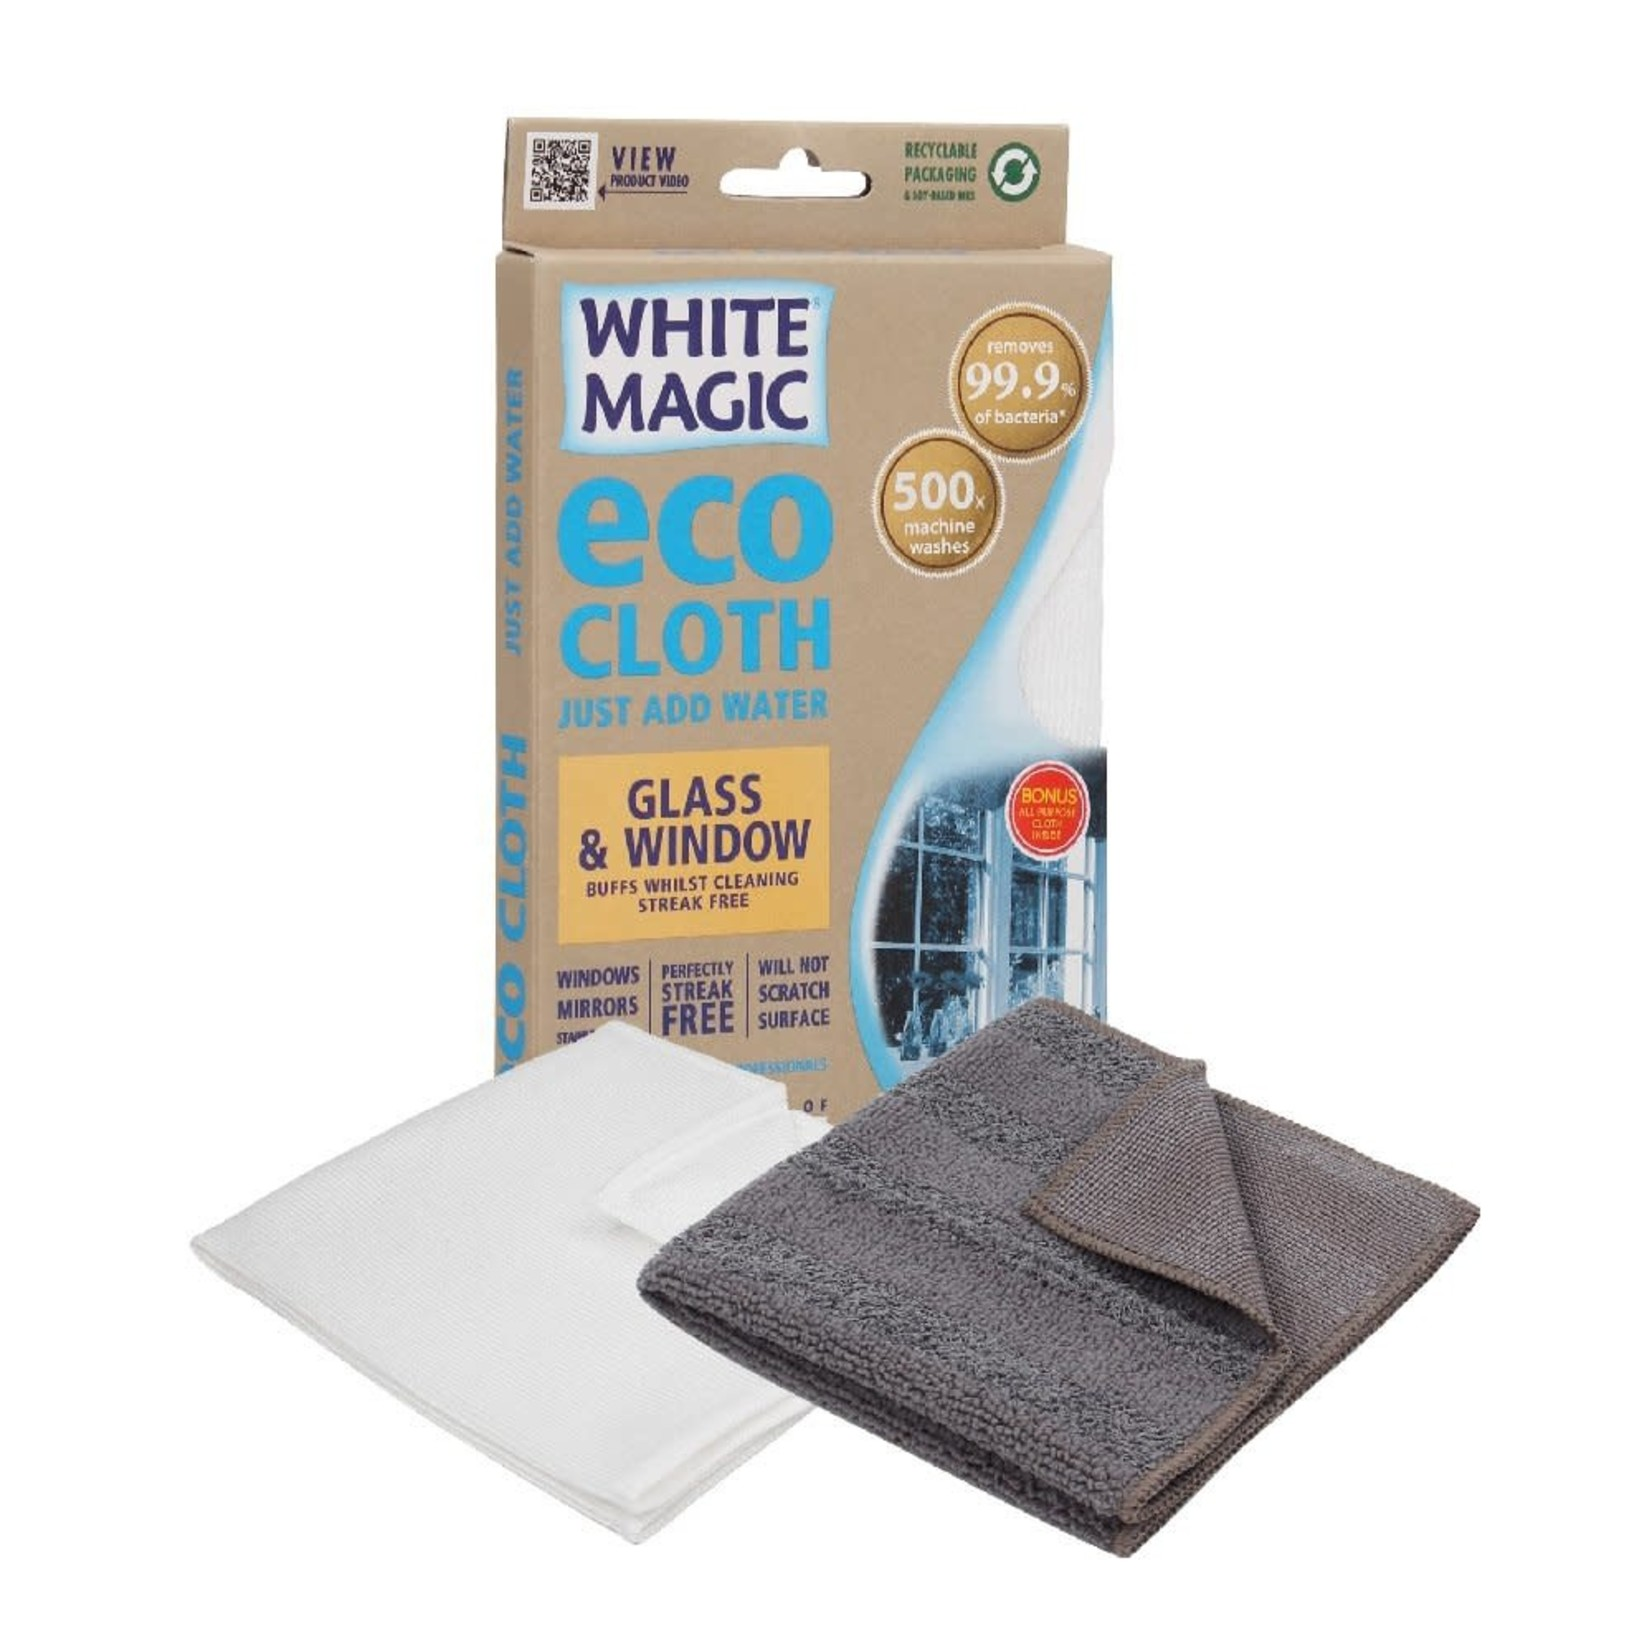 White Magic White Magic Eco Cloth Glass & Window